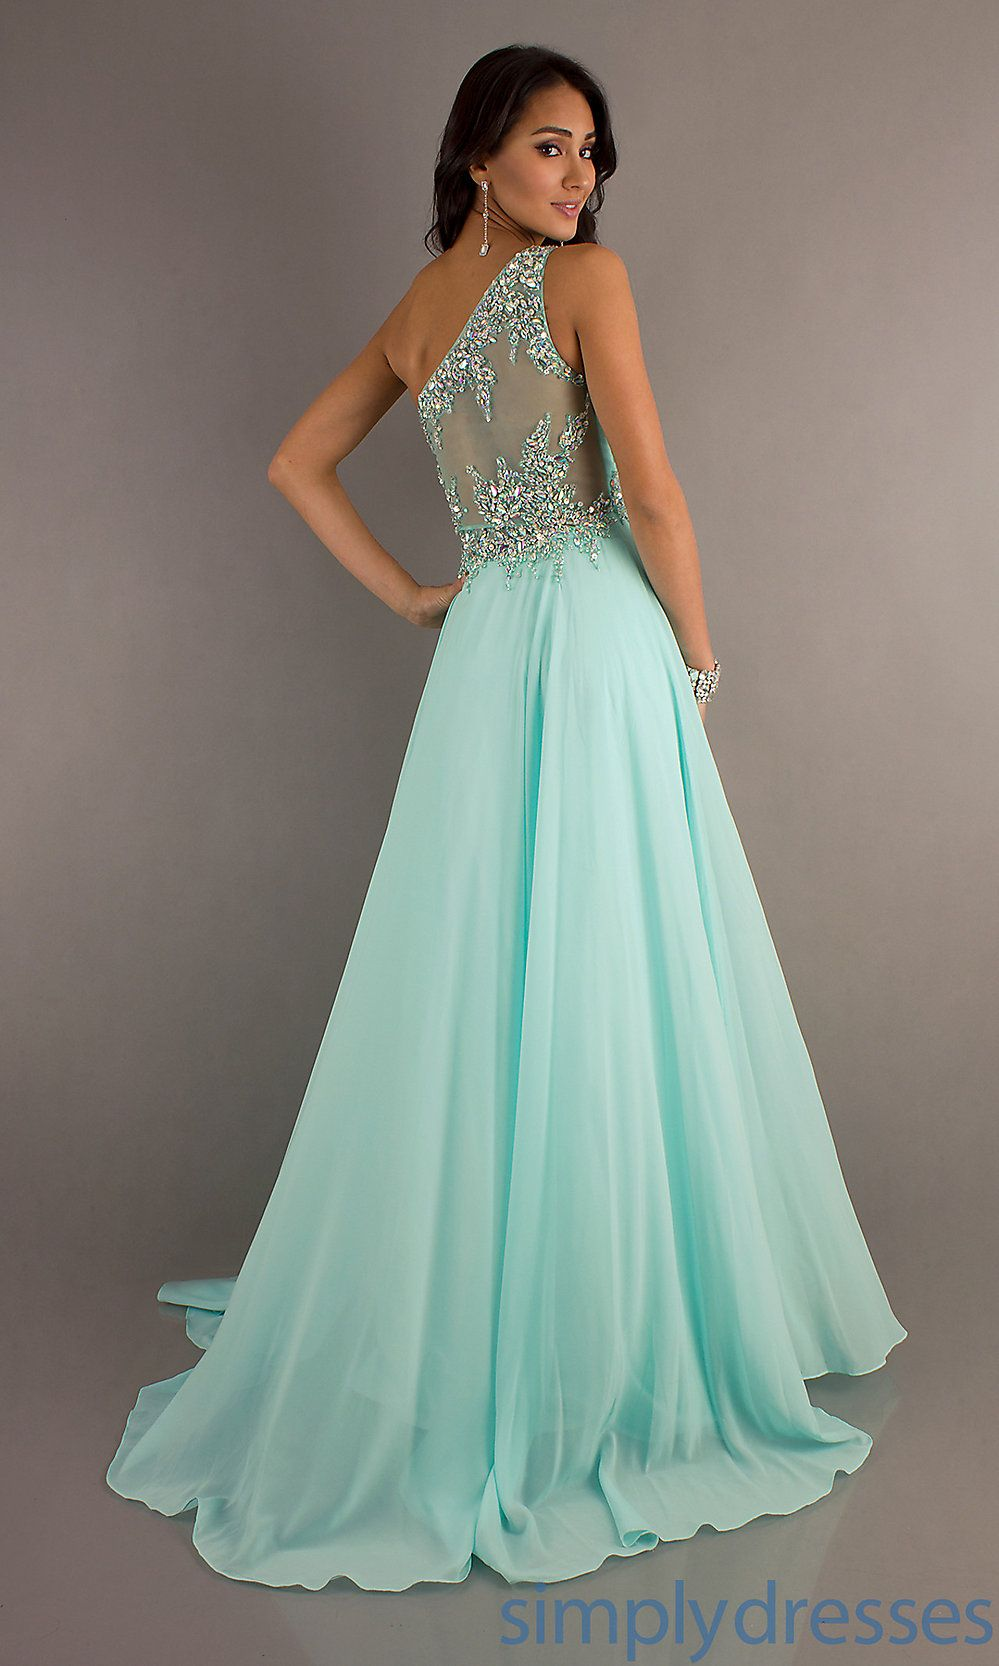 One Shoulder A-Line Dress, Tiffany Prom Dresses - Simply Dresses ...